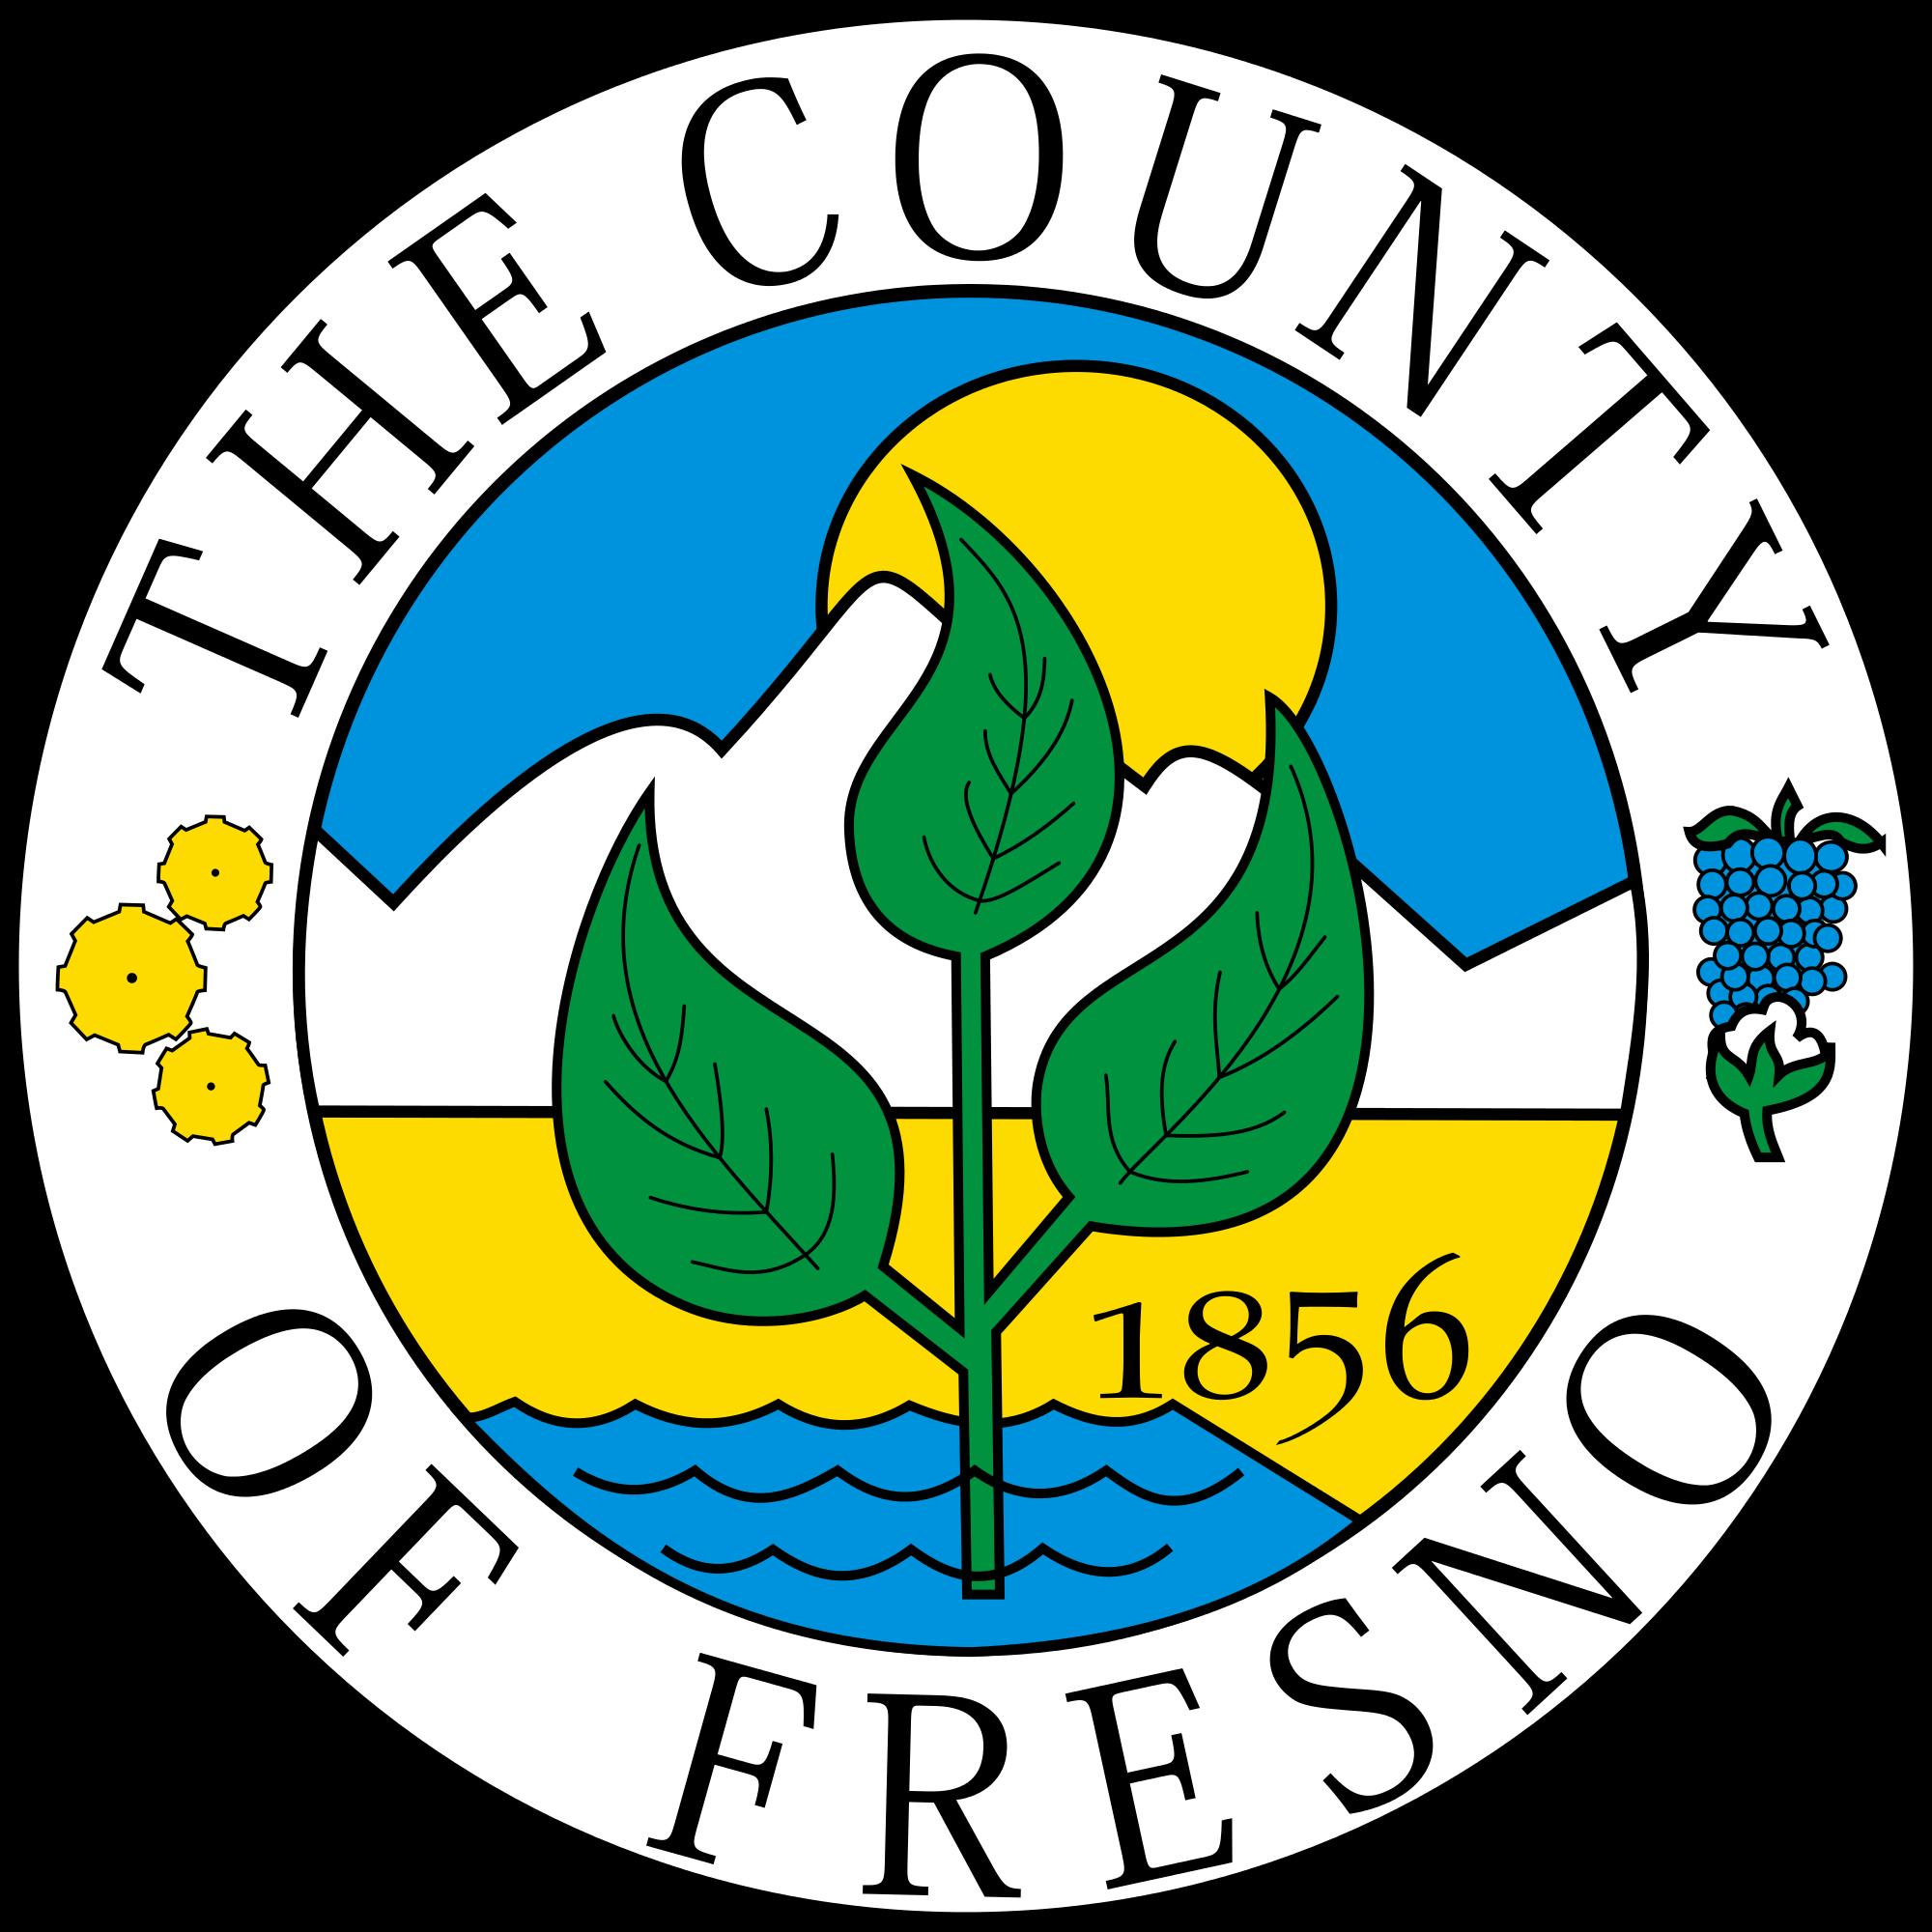 Fresno County Fresno County Fresno Genealogy History